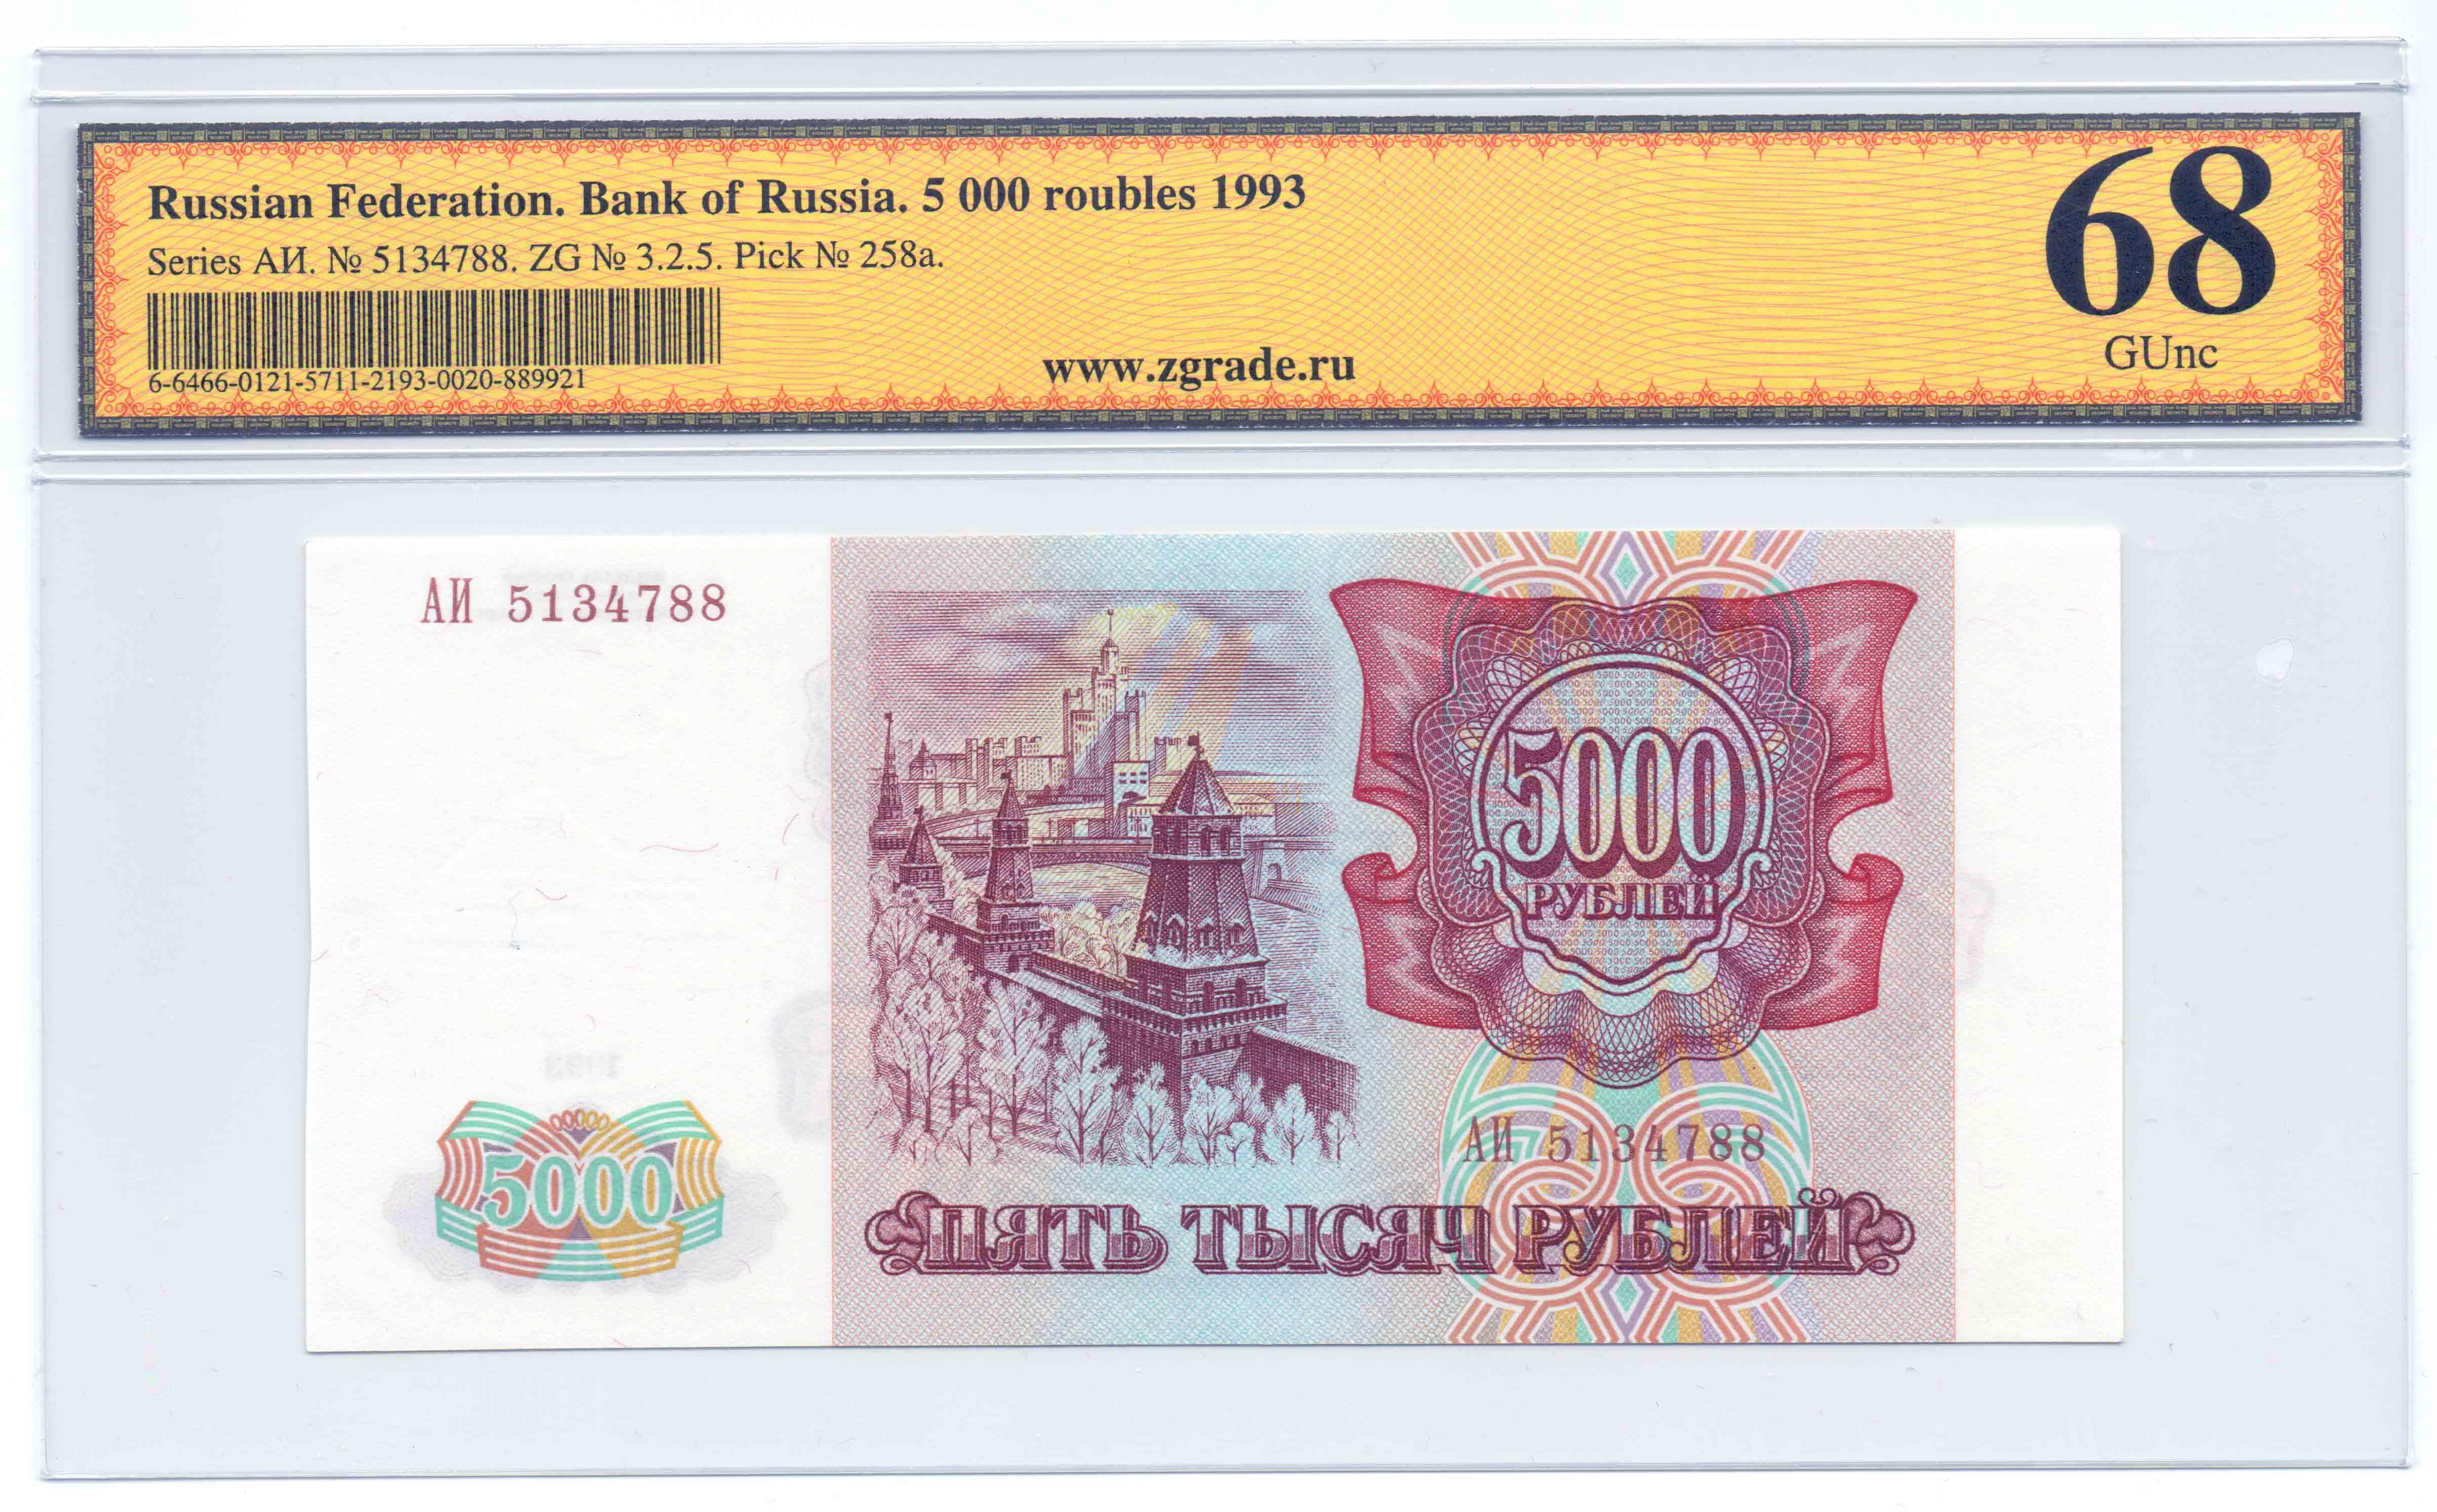 5 000 рублей 1993 г. АИ 5134788 ZG № 3.2.5. 68 GUnc Pick.258a  #Б001-006